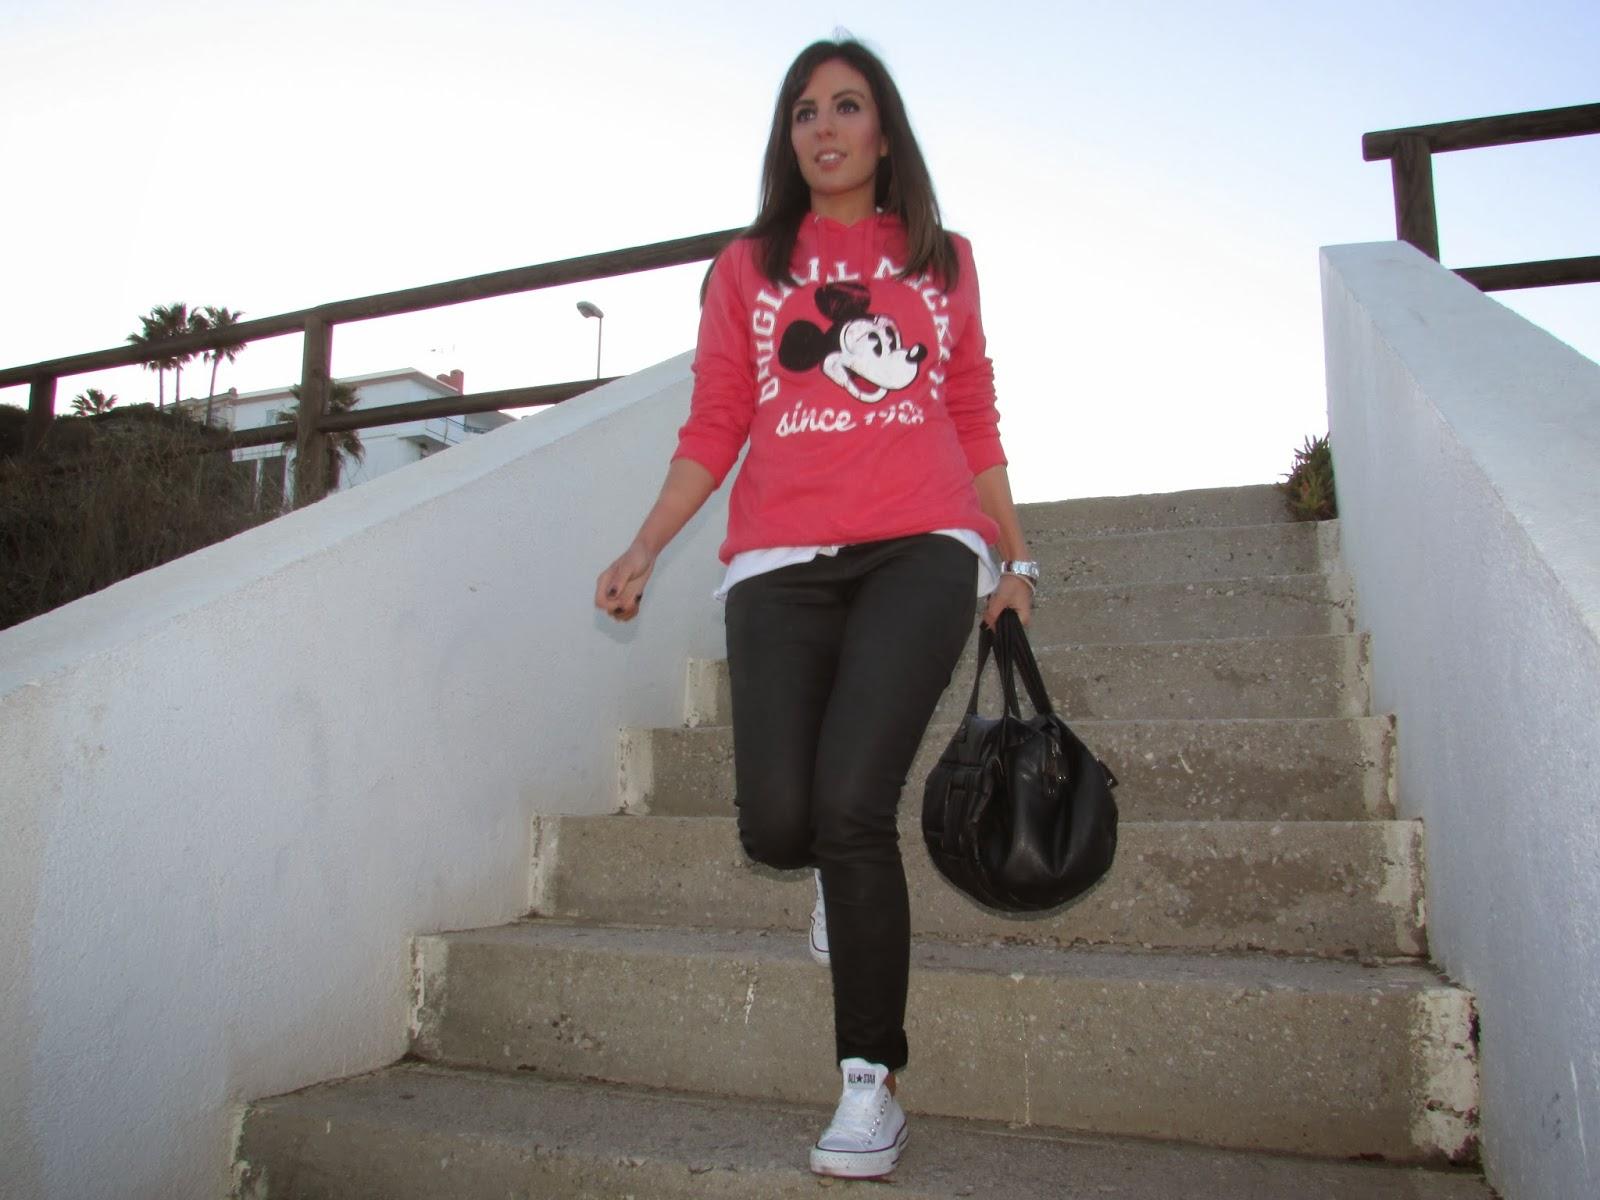 street style cristina style fashion blogger malaga blogger malagueña tendencias moda ootd outfit look gorgeous lovely inspiration zara converse